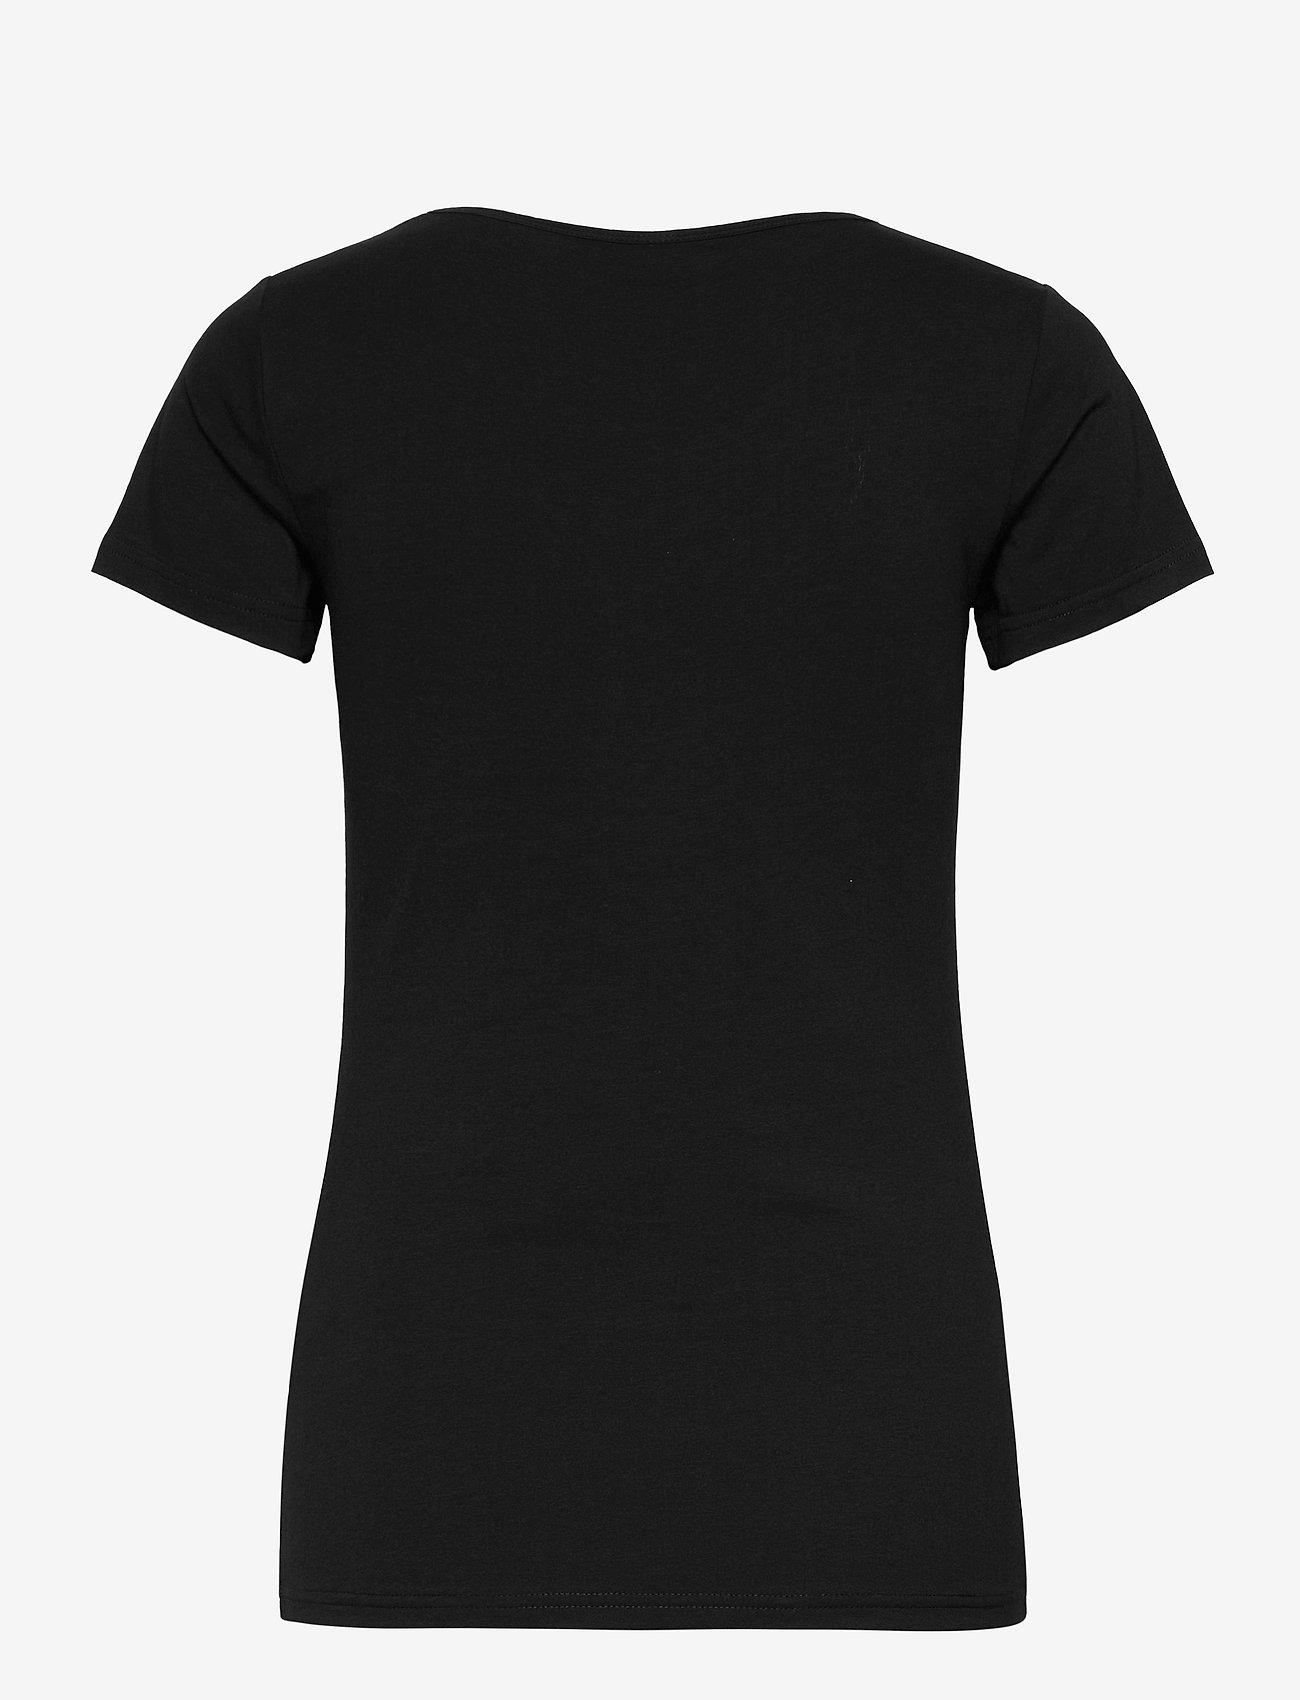 Soyaconcept - SC-PYLLE - t-shirt & tops - black - 1